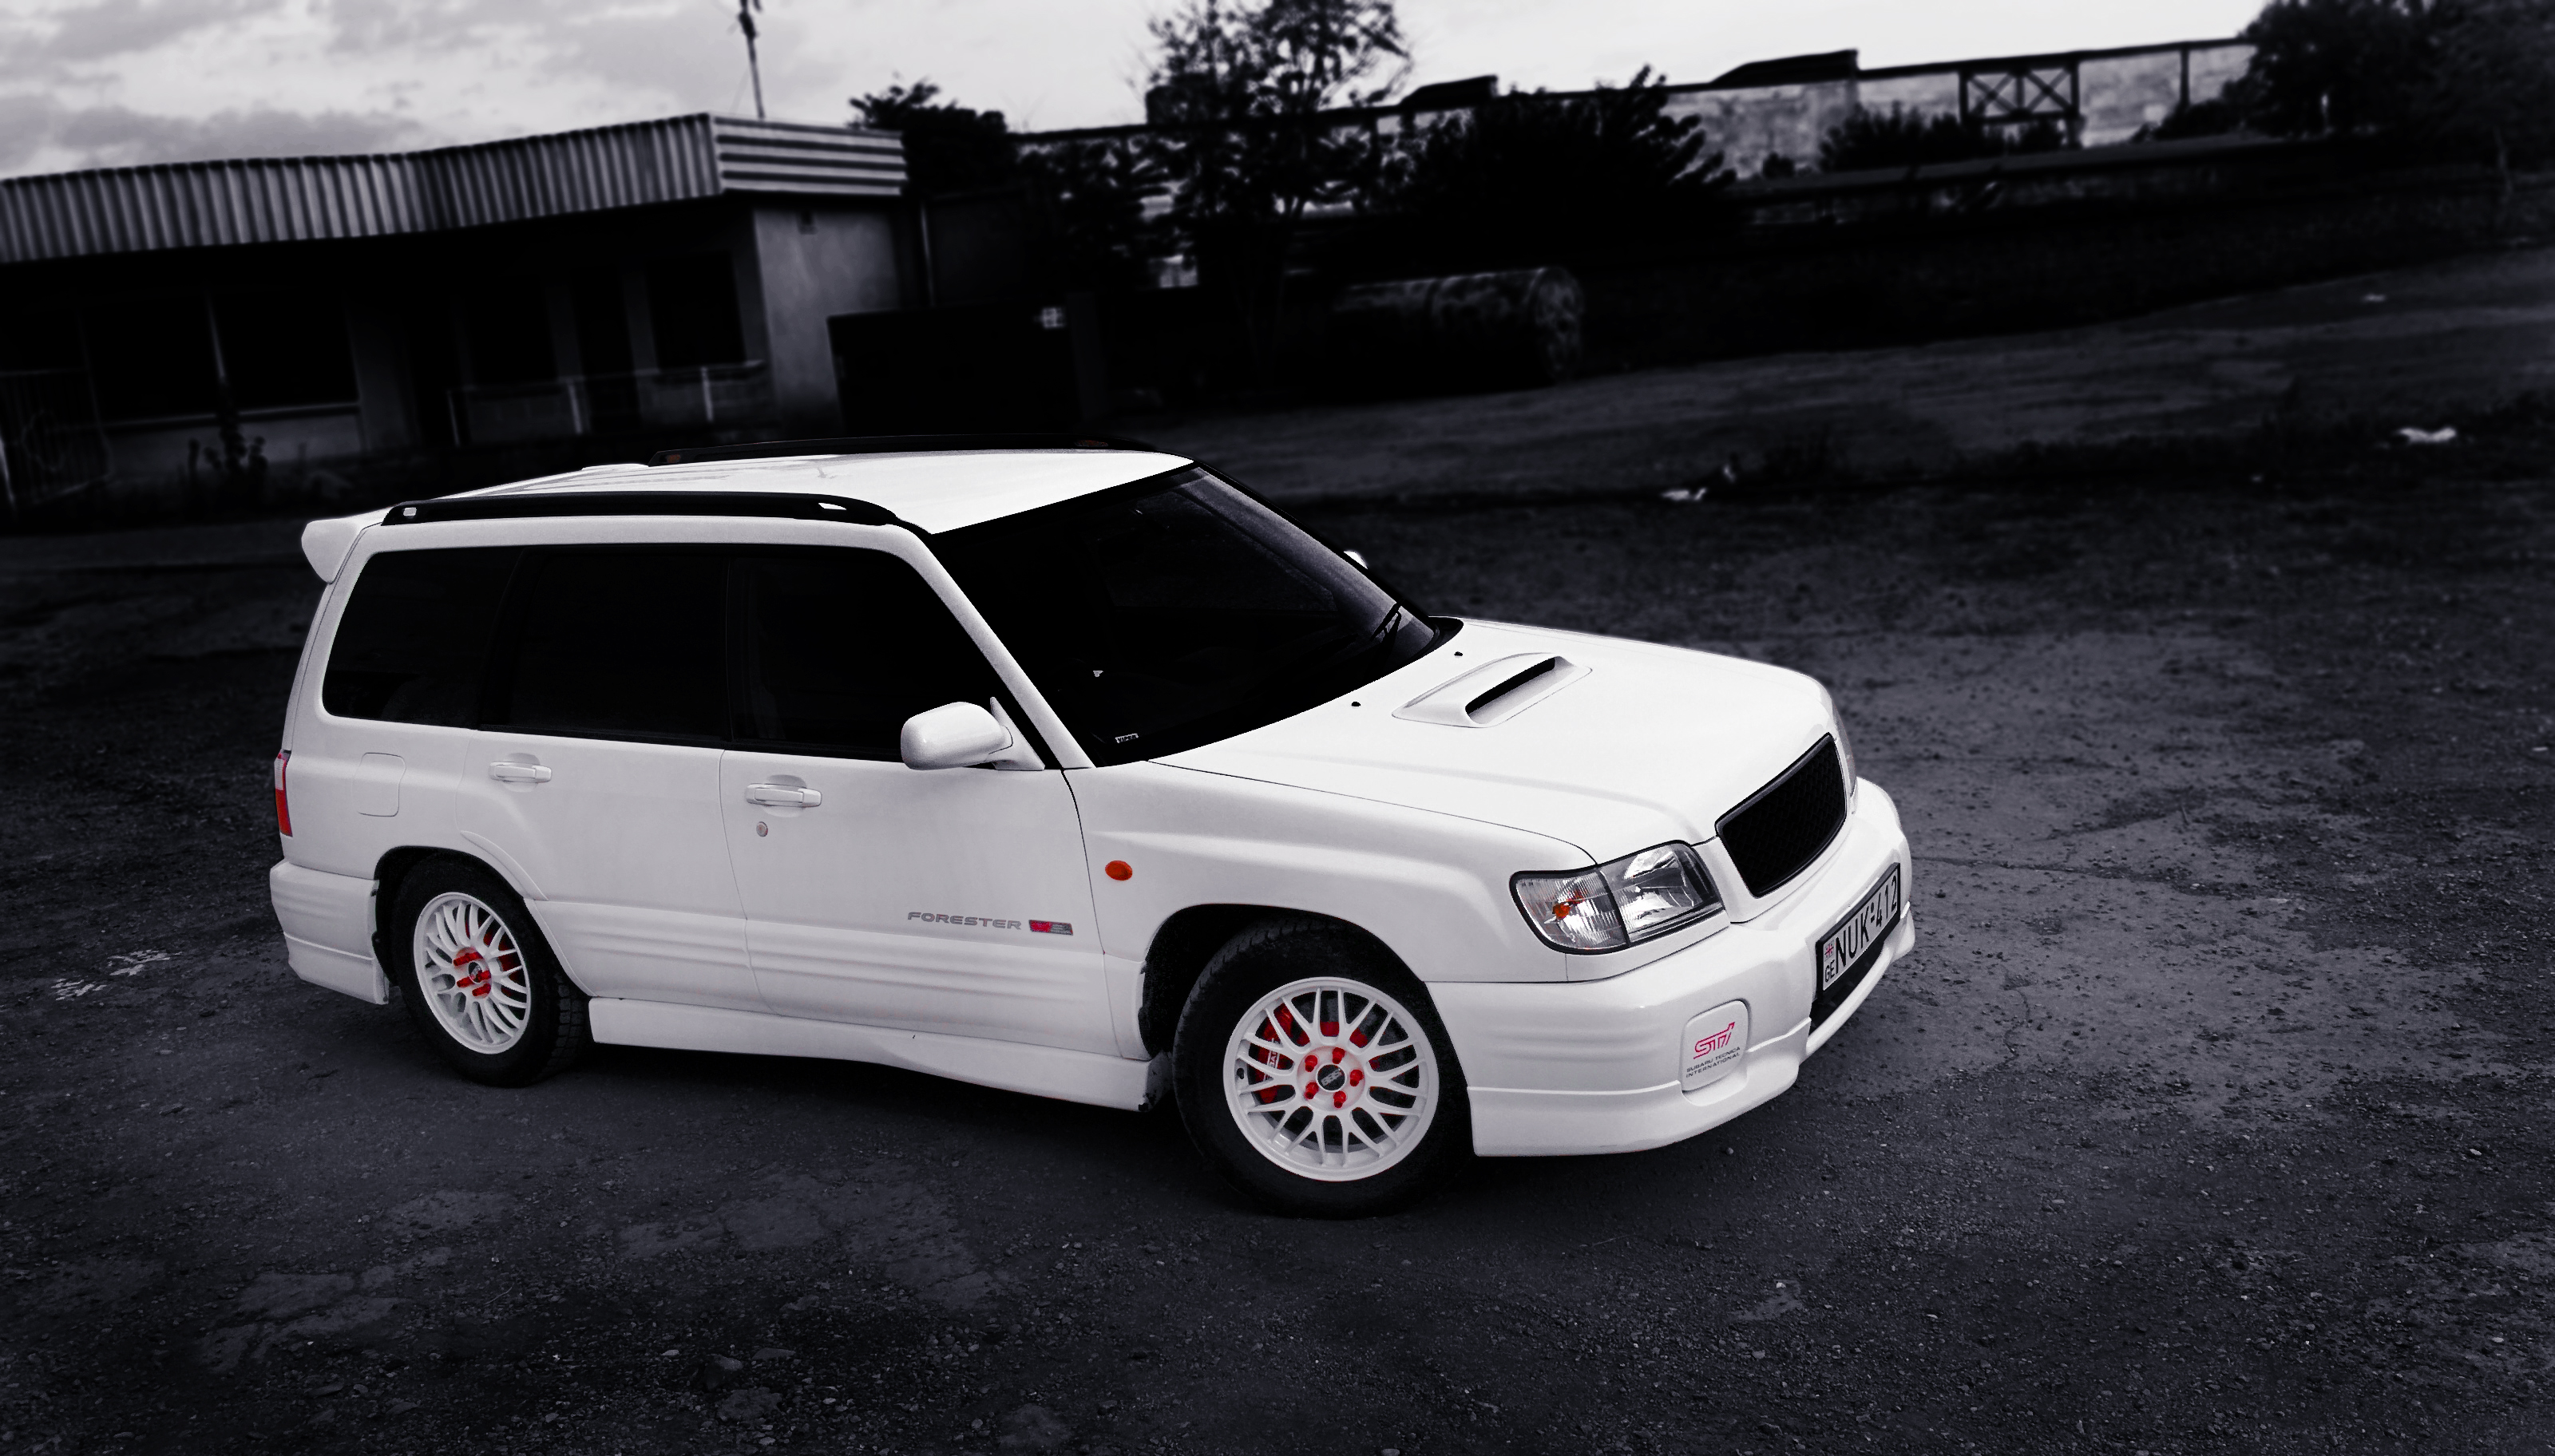 2000 Subaru Forester Stb Sti